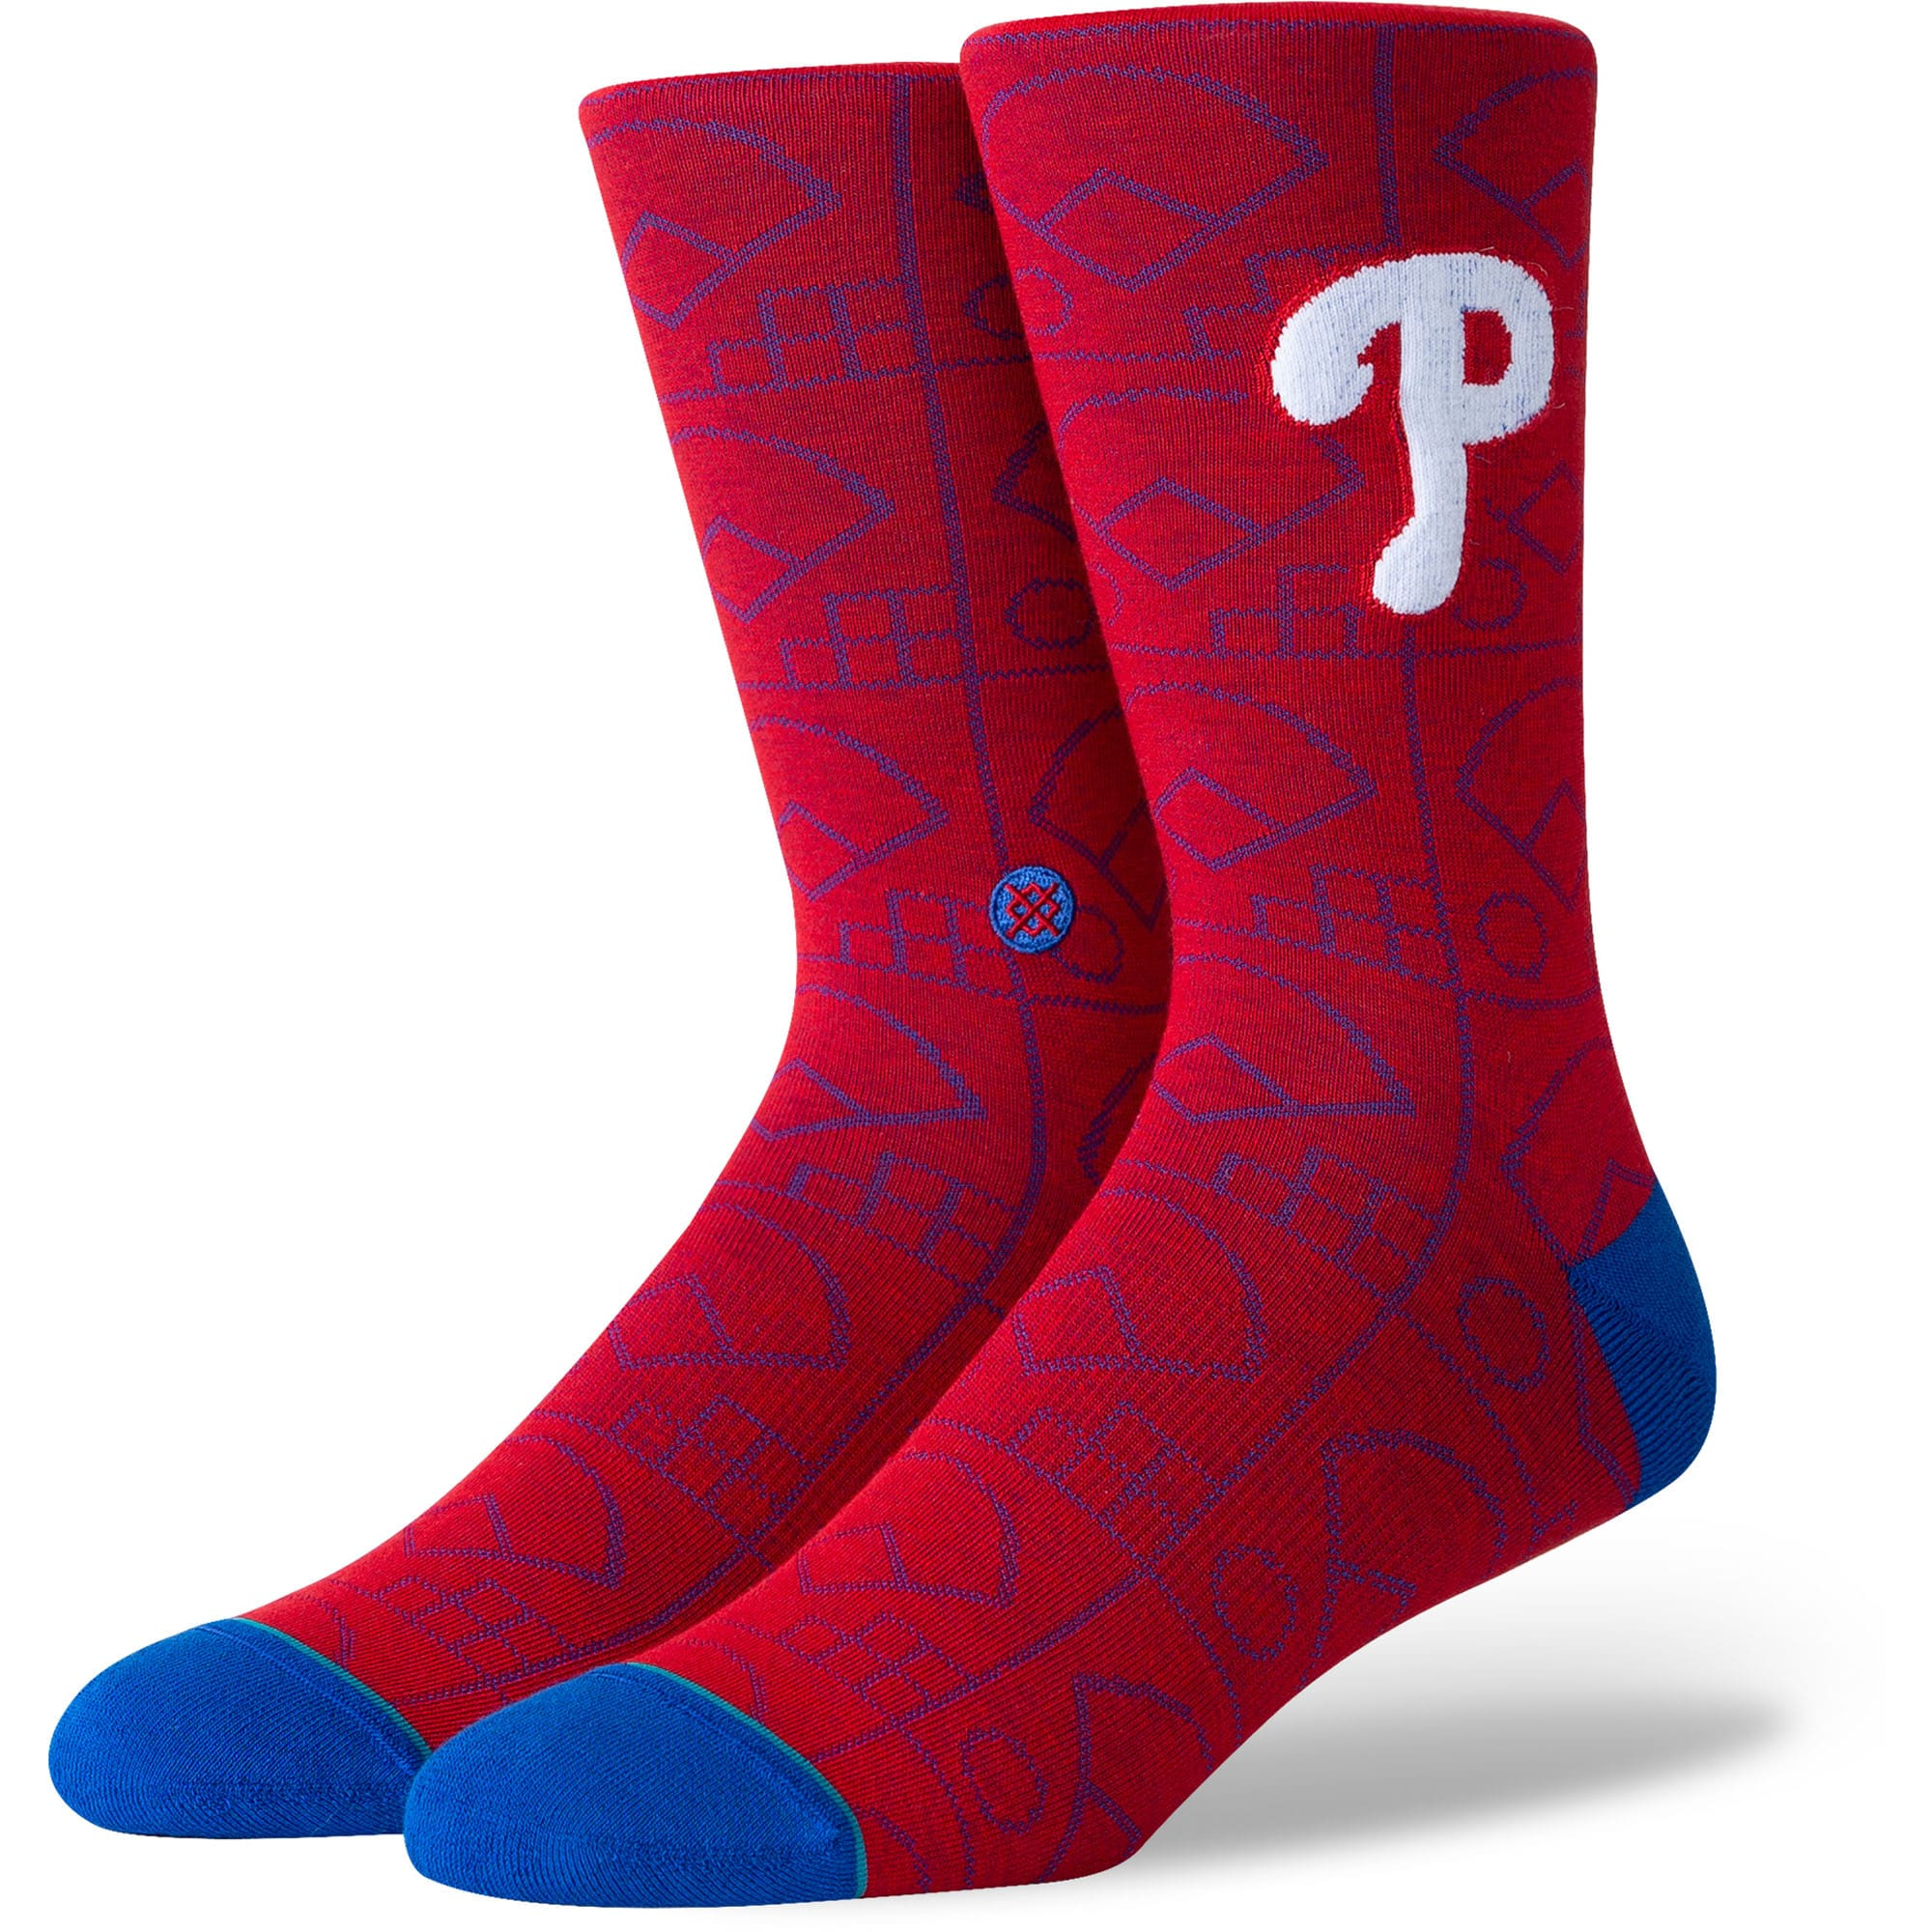 Philadelphia Phillies Stance Scorebook Crew Socks - Red